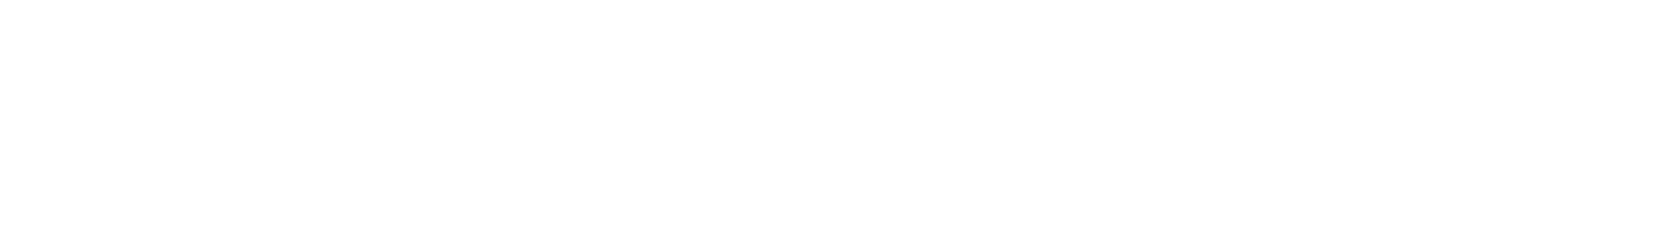 misuzu-logo-jp